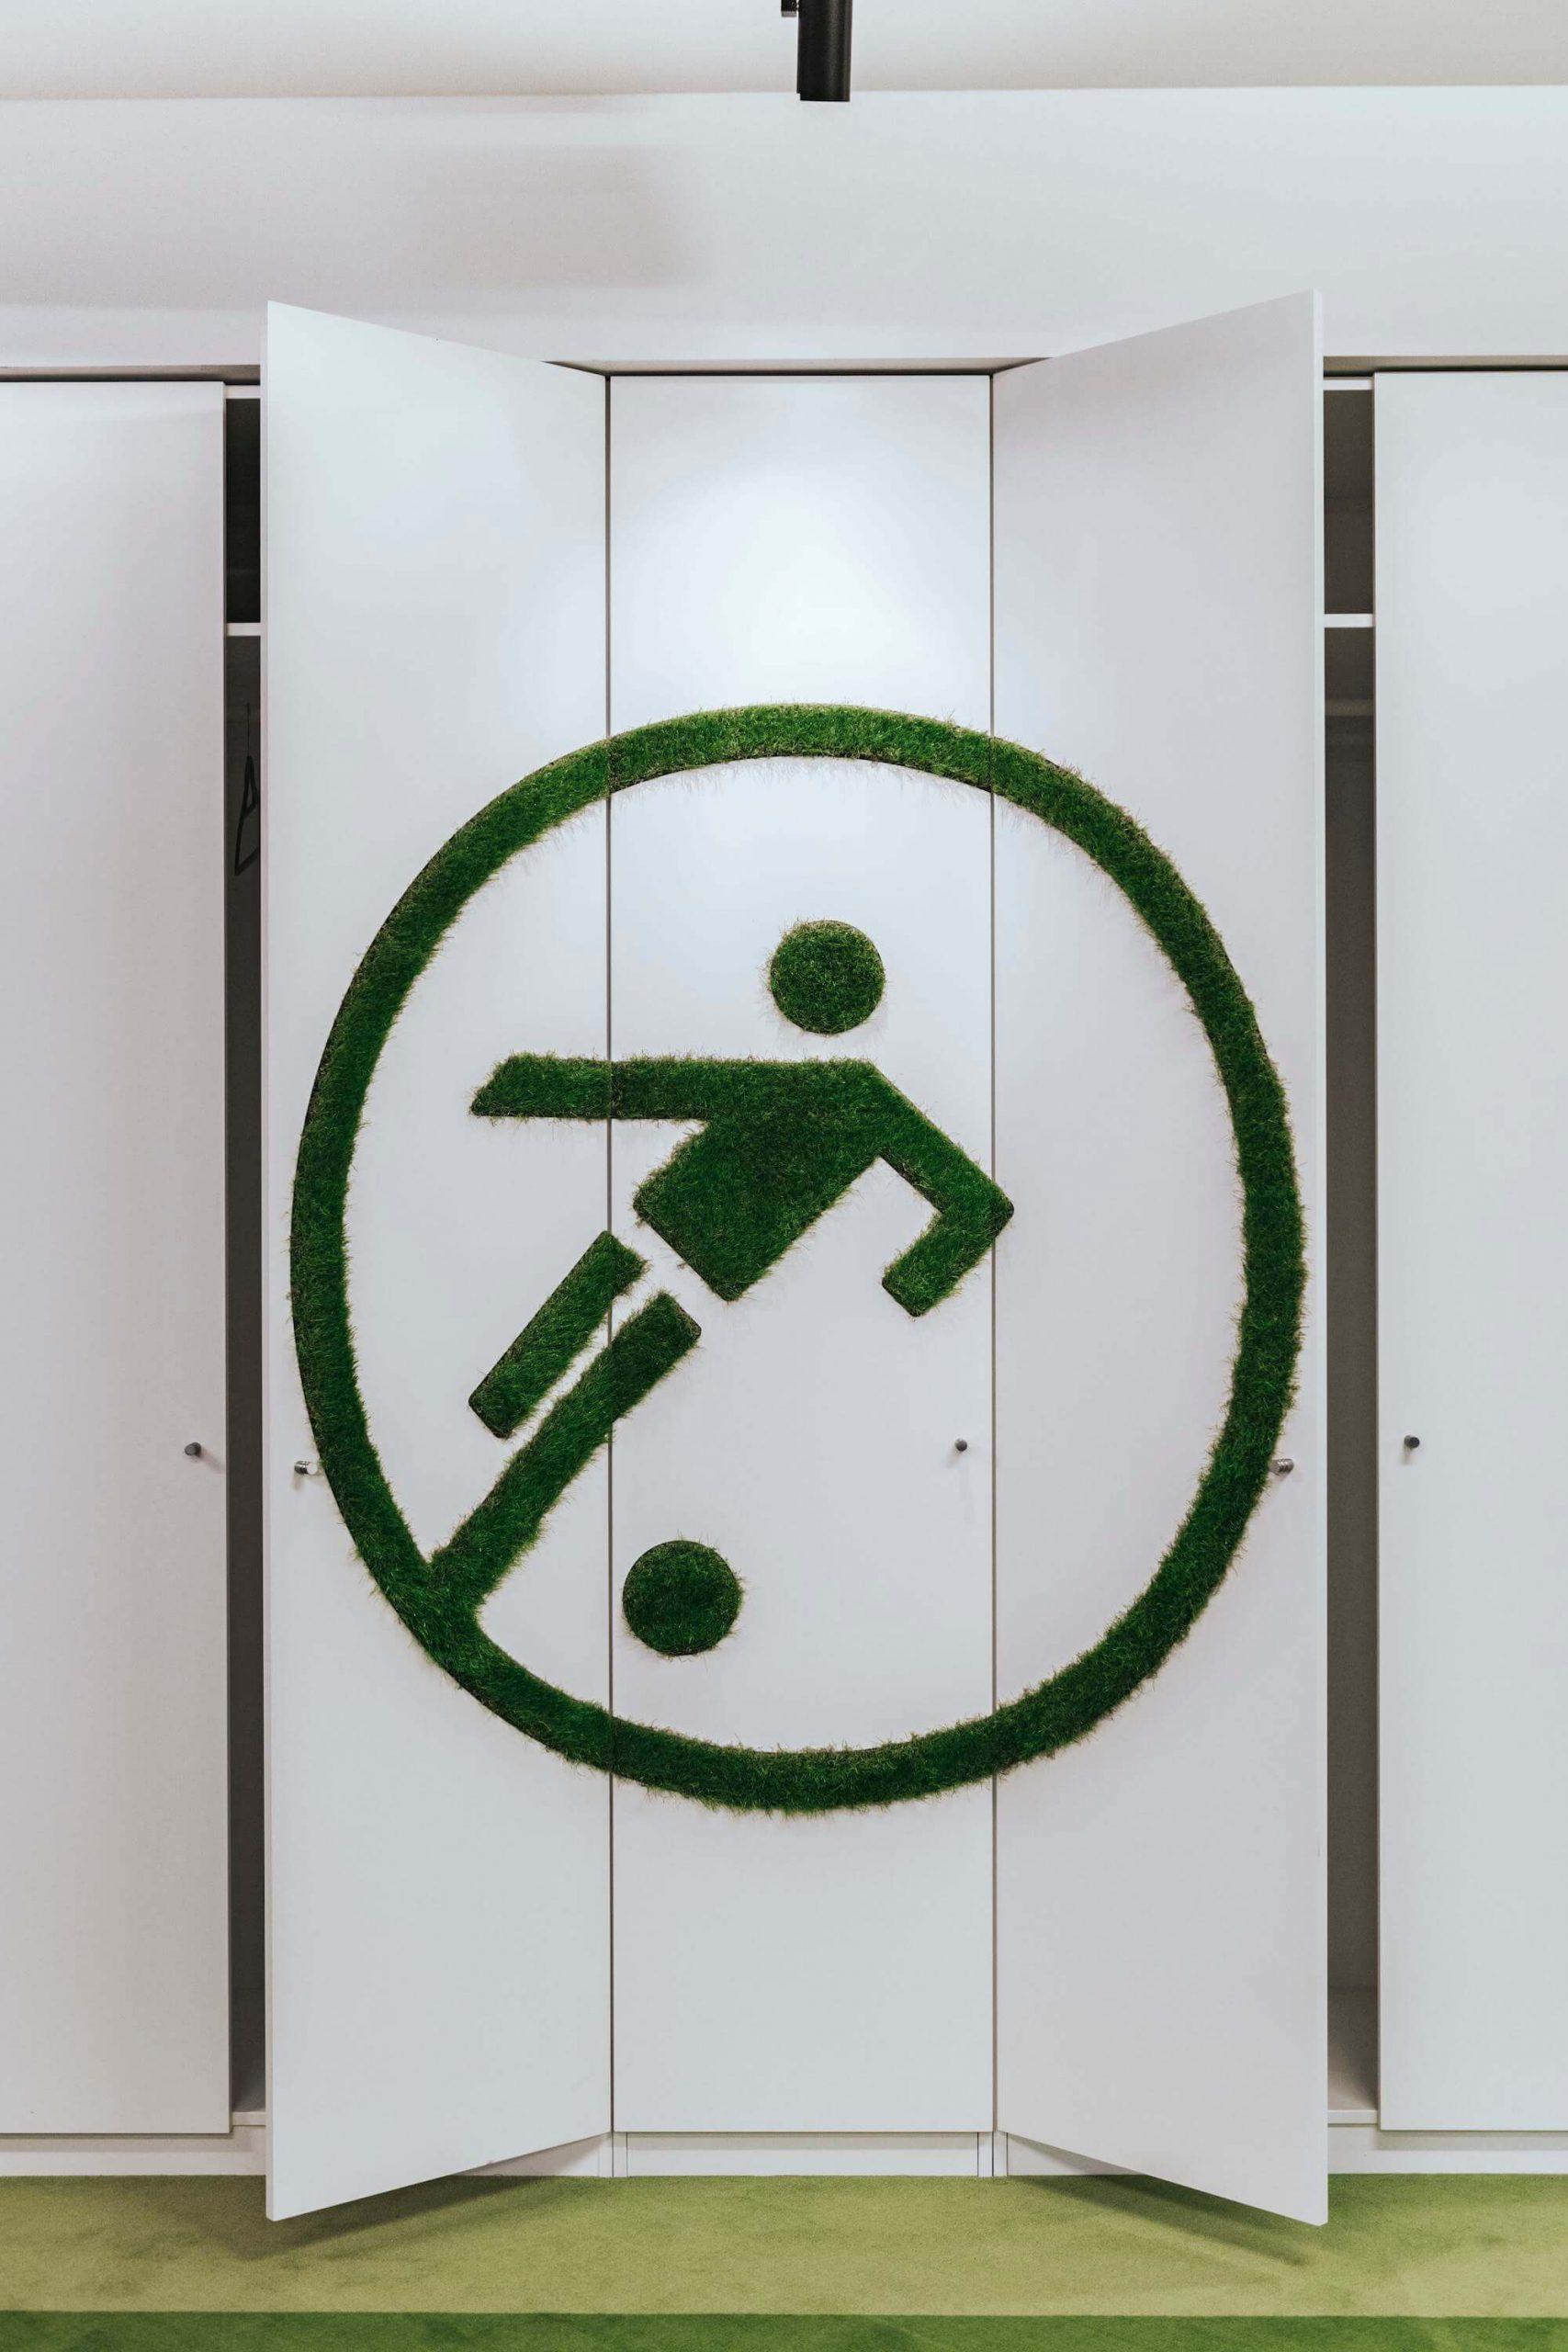 Onefootball Startup Büro TKEZ Architekten Fussball Logo